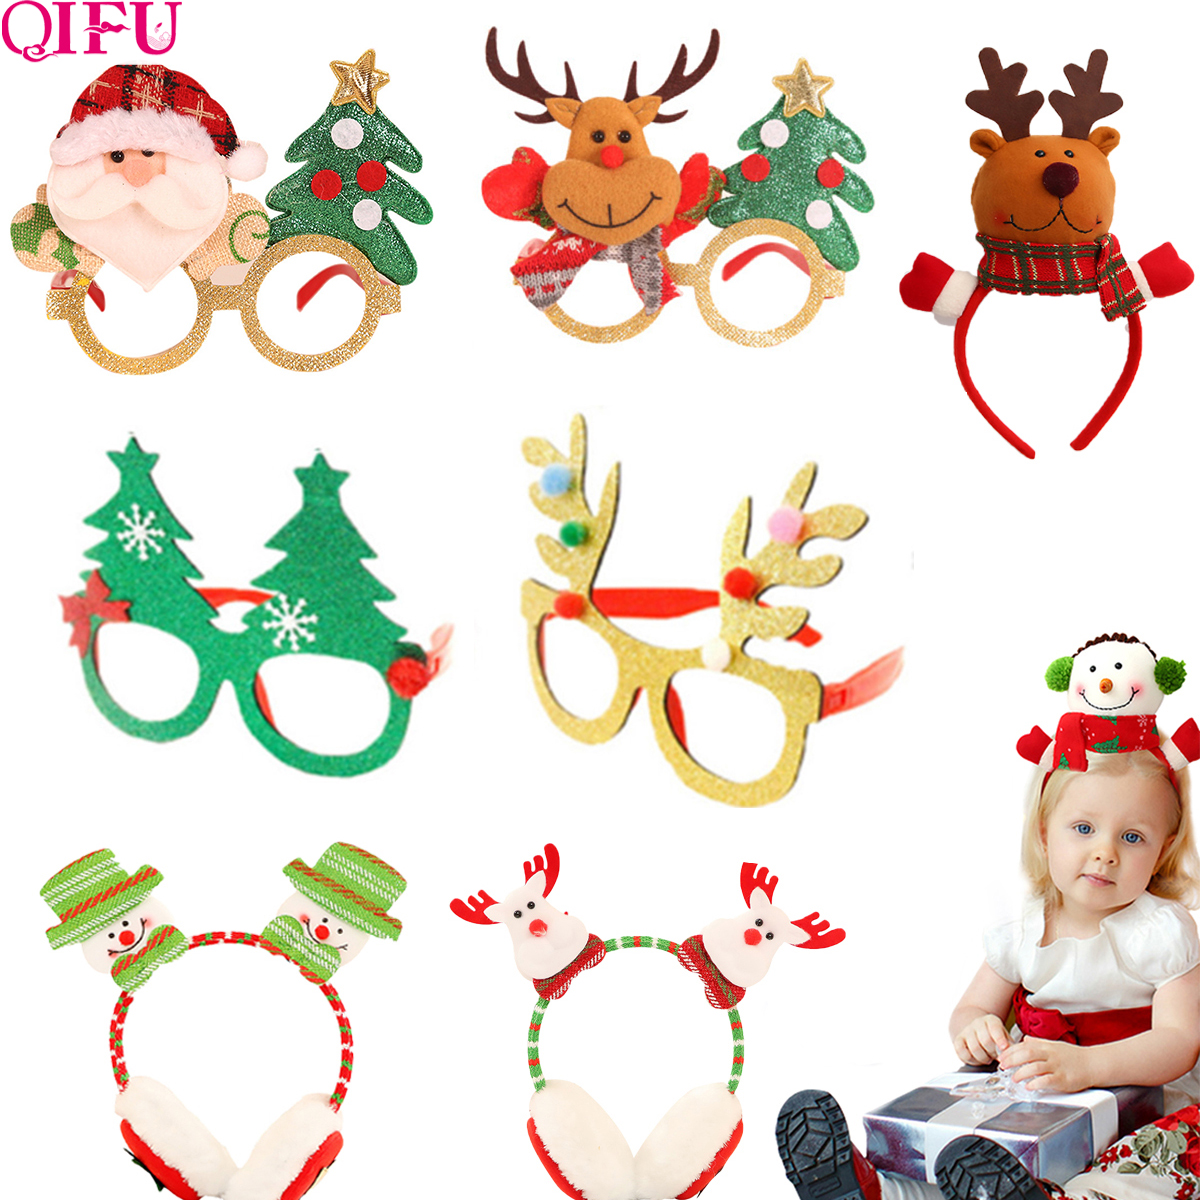 New Christmas Items 2020 QIFU 2019 christmas glasses Frame Headband Christmas Ornaments